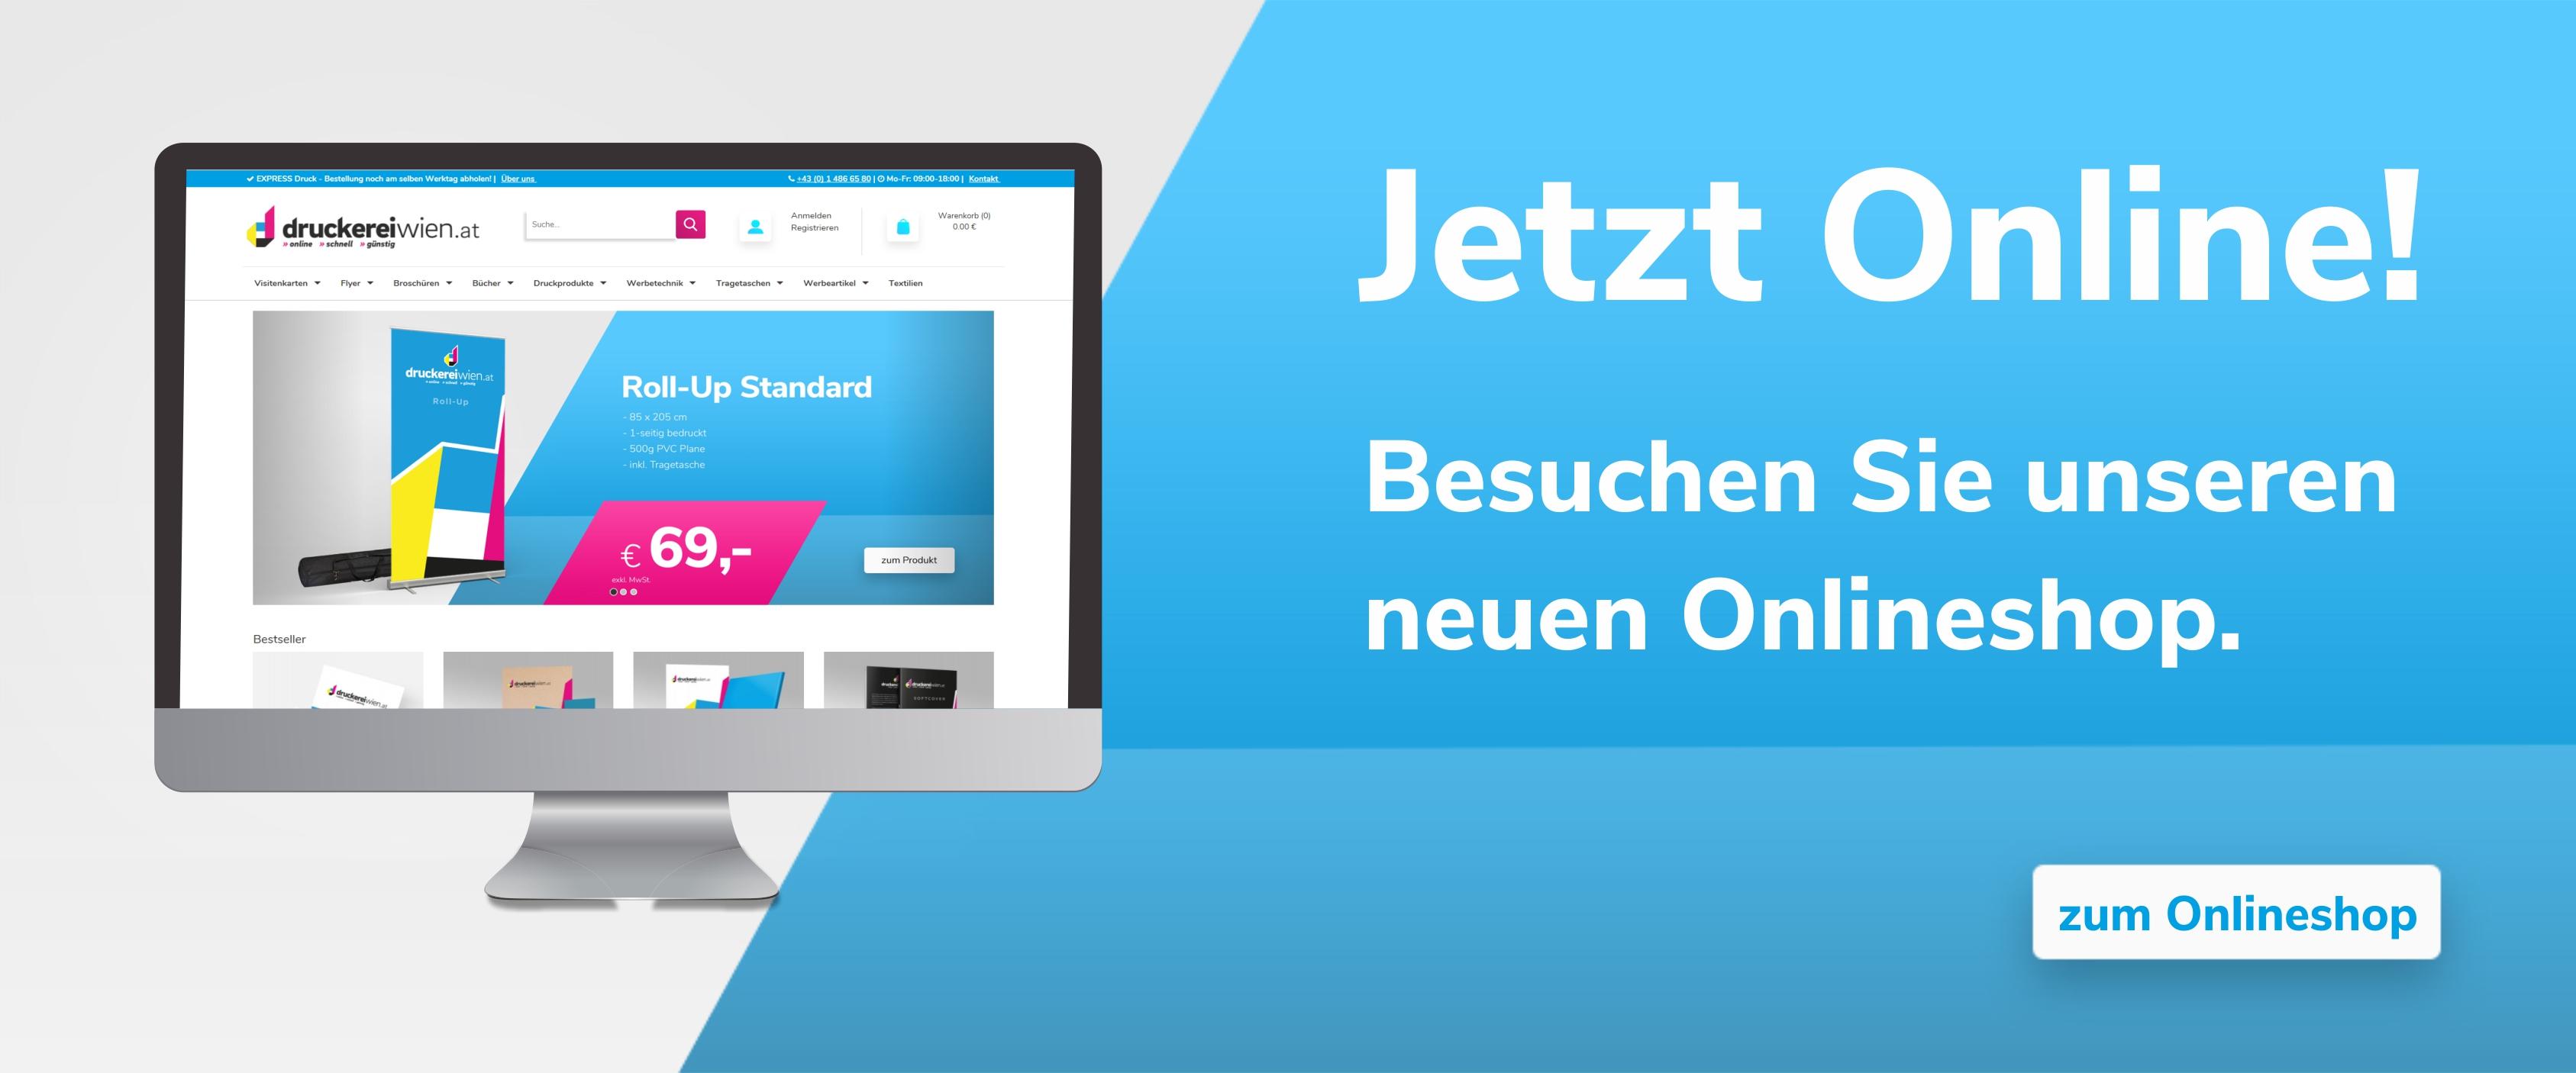 Druckerei Wien Wiener Druckerei Online Druckerei In Wien